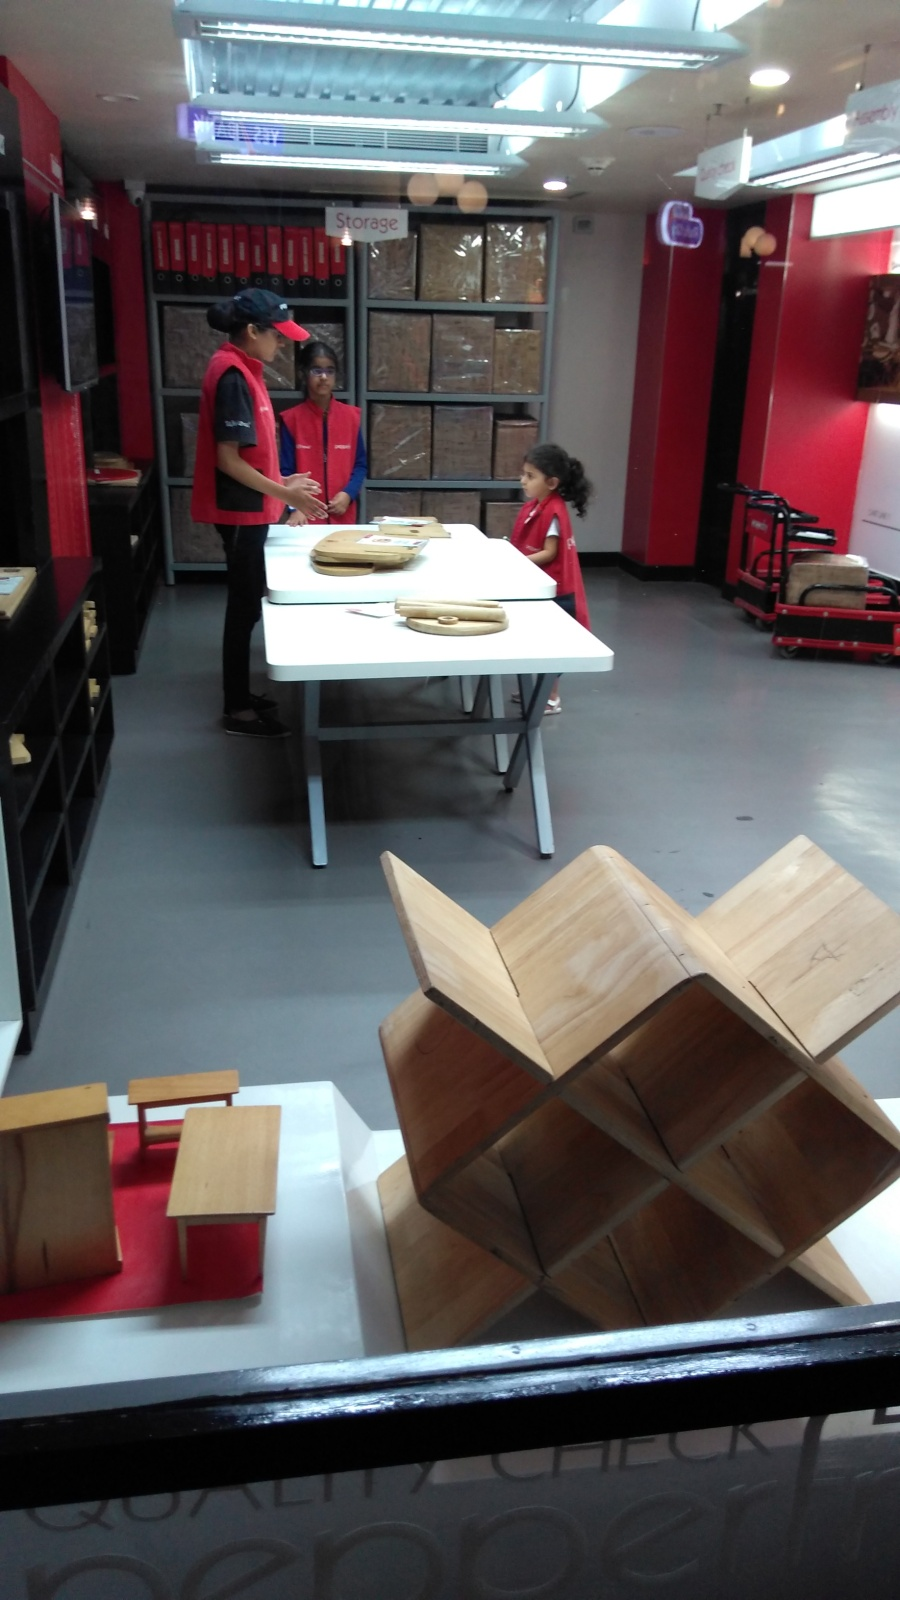 Woodcraft course (relishingrascal.wordpress.com)